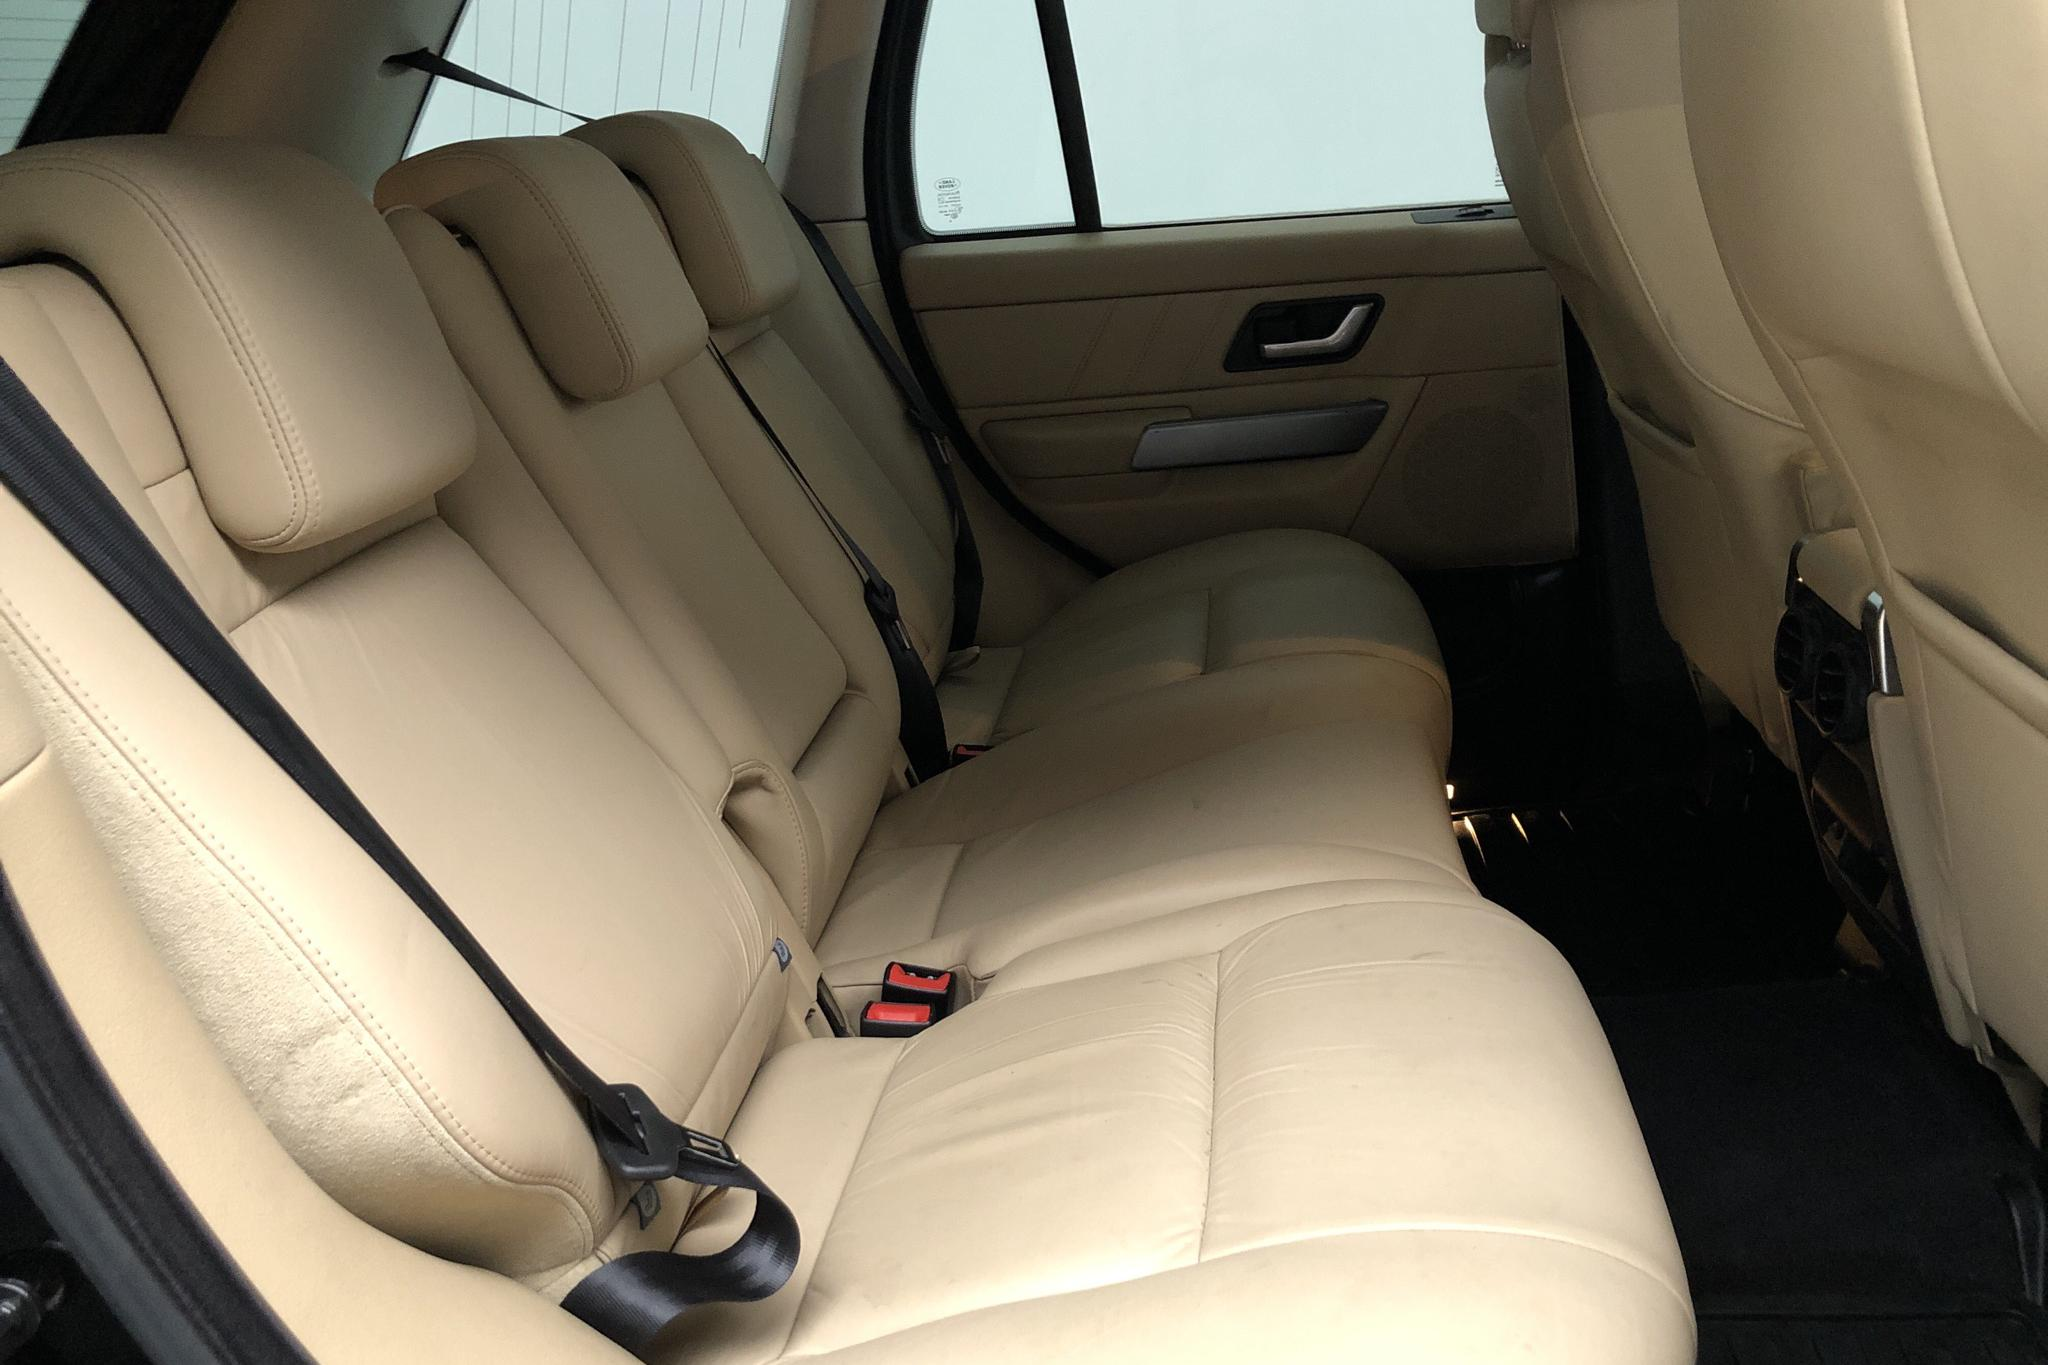 Land Rover Range Rover Sport TDV6 (190hk) - 4 518 mil - Automat - svart - 2008